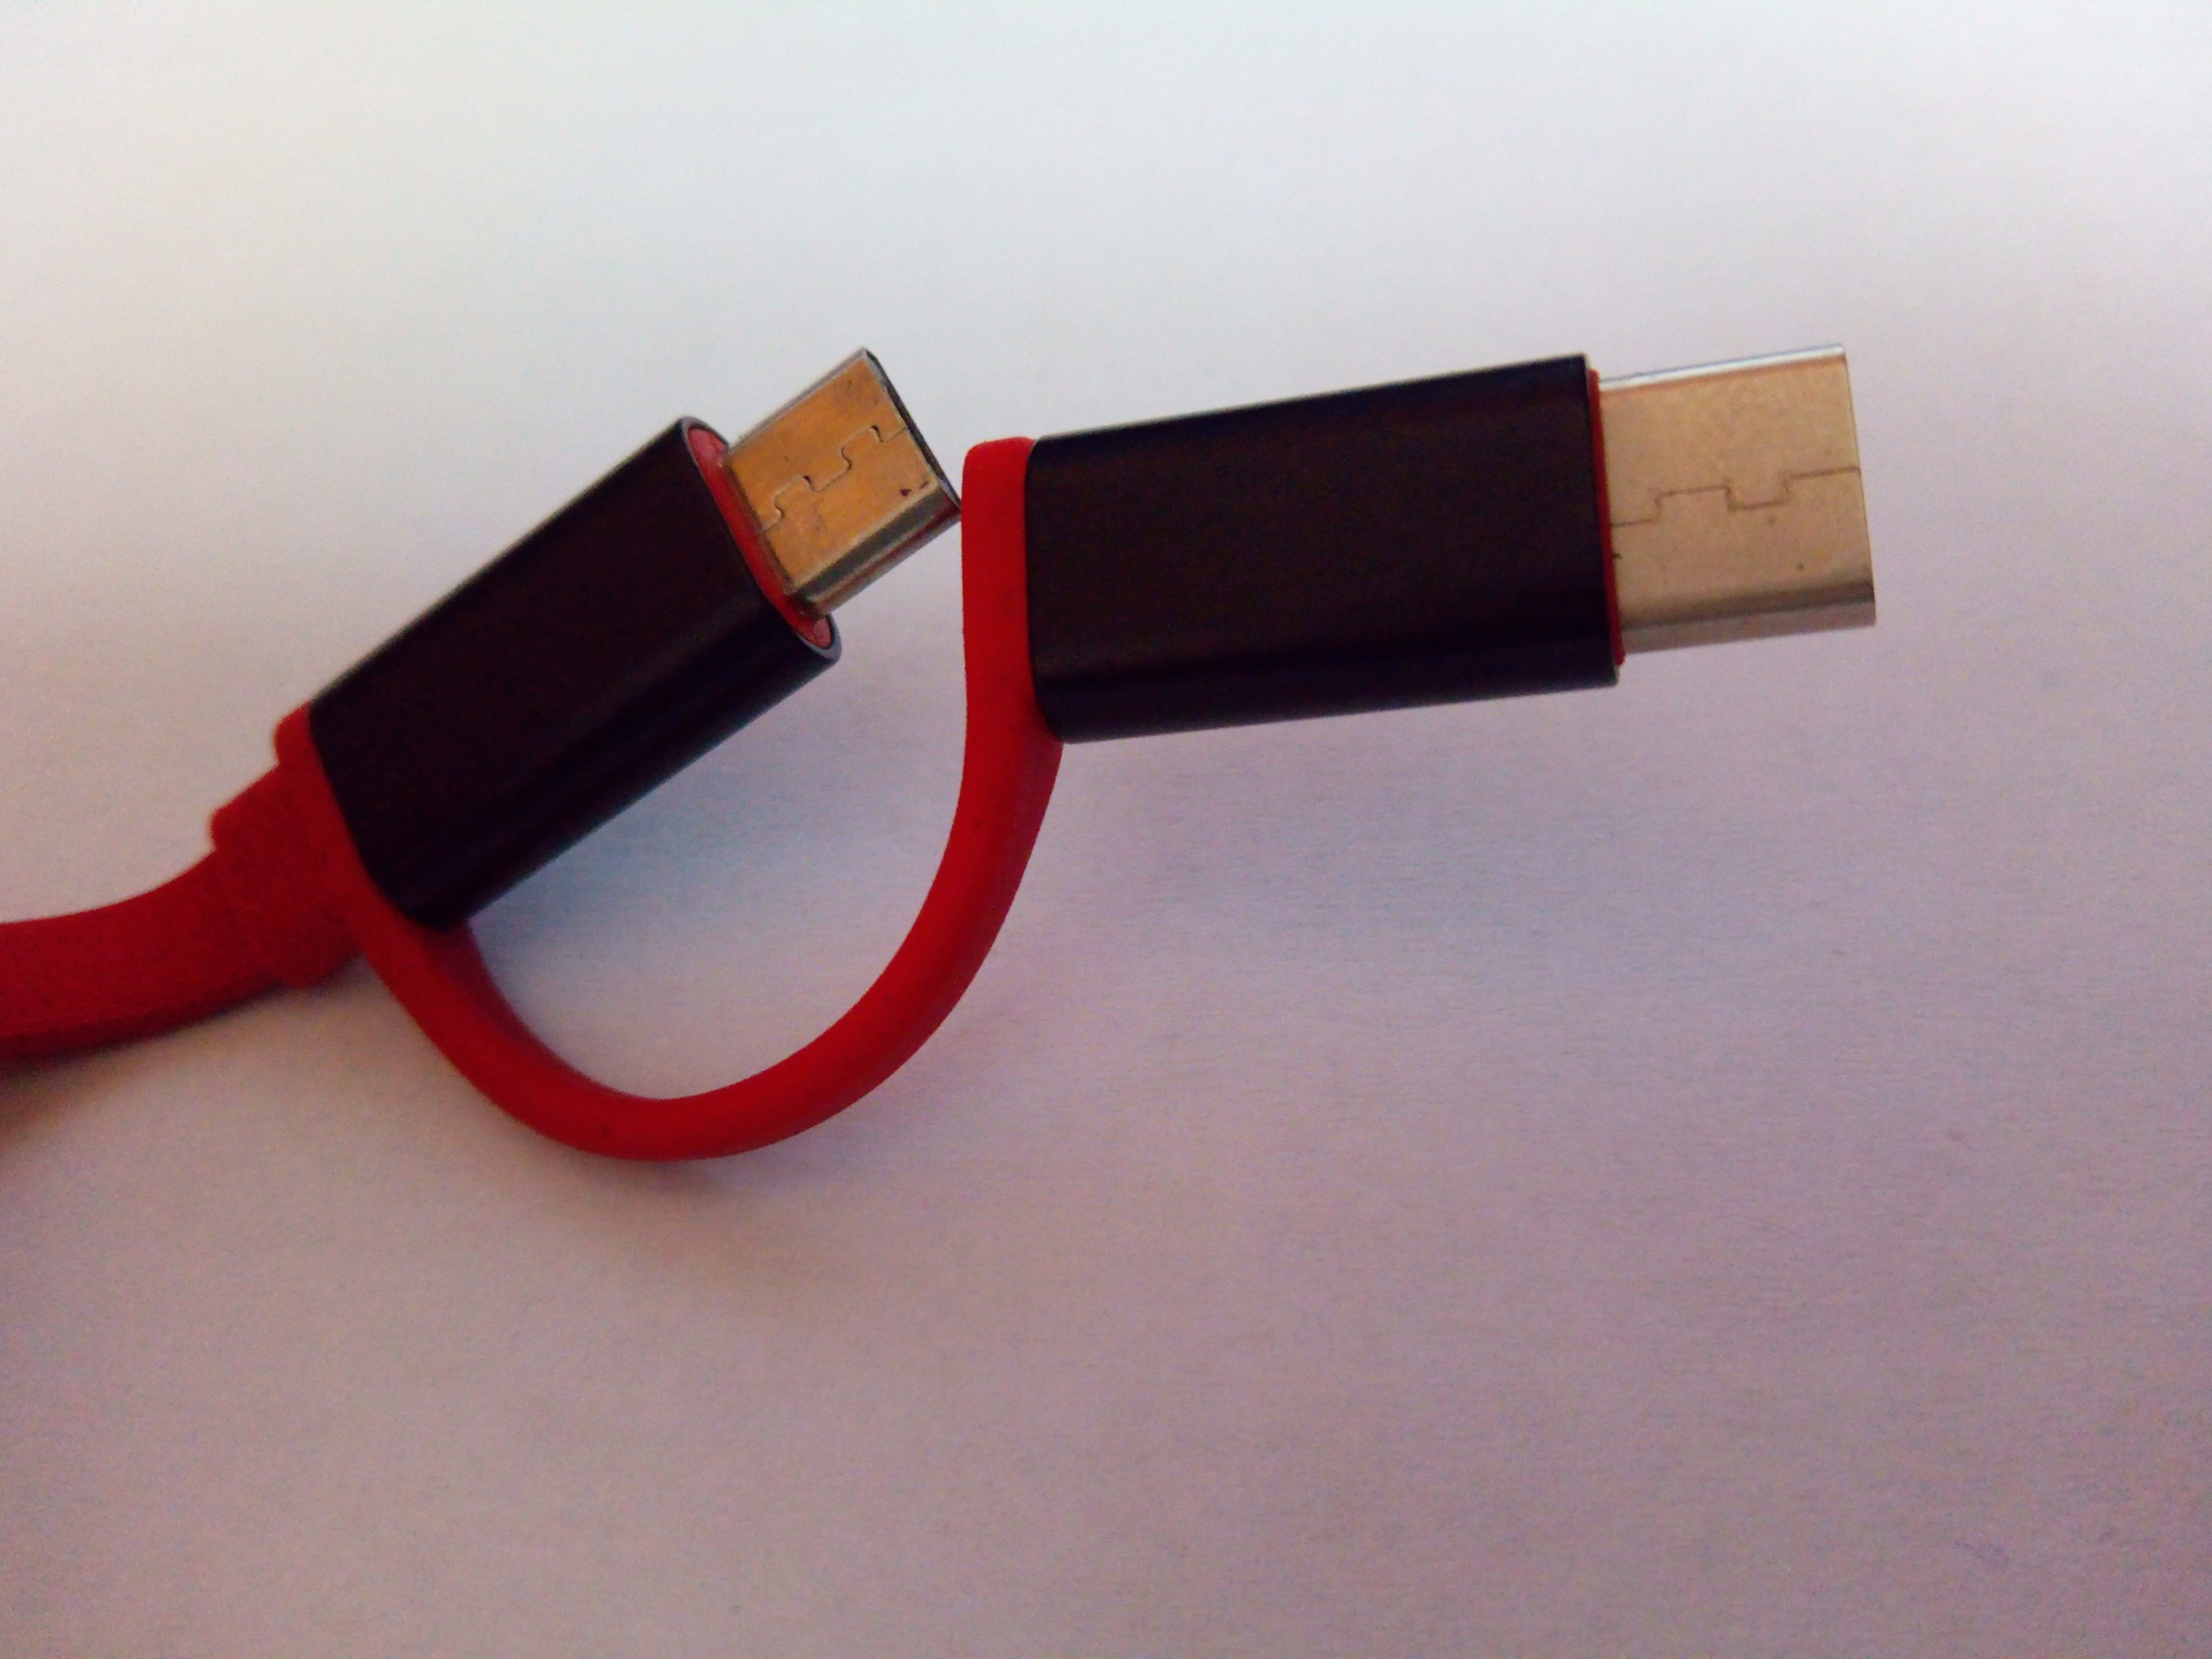 Aliexpress: Чехол-кошелек-картхолдер и кабель с переходником от micro-usb на type-c